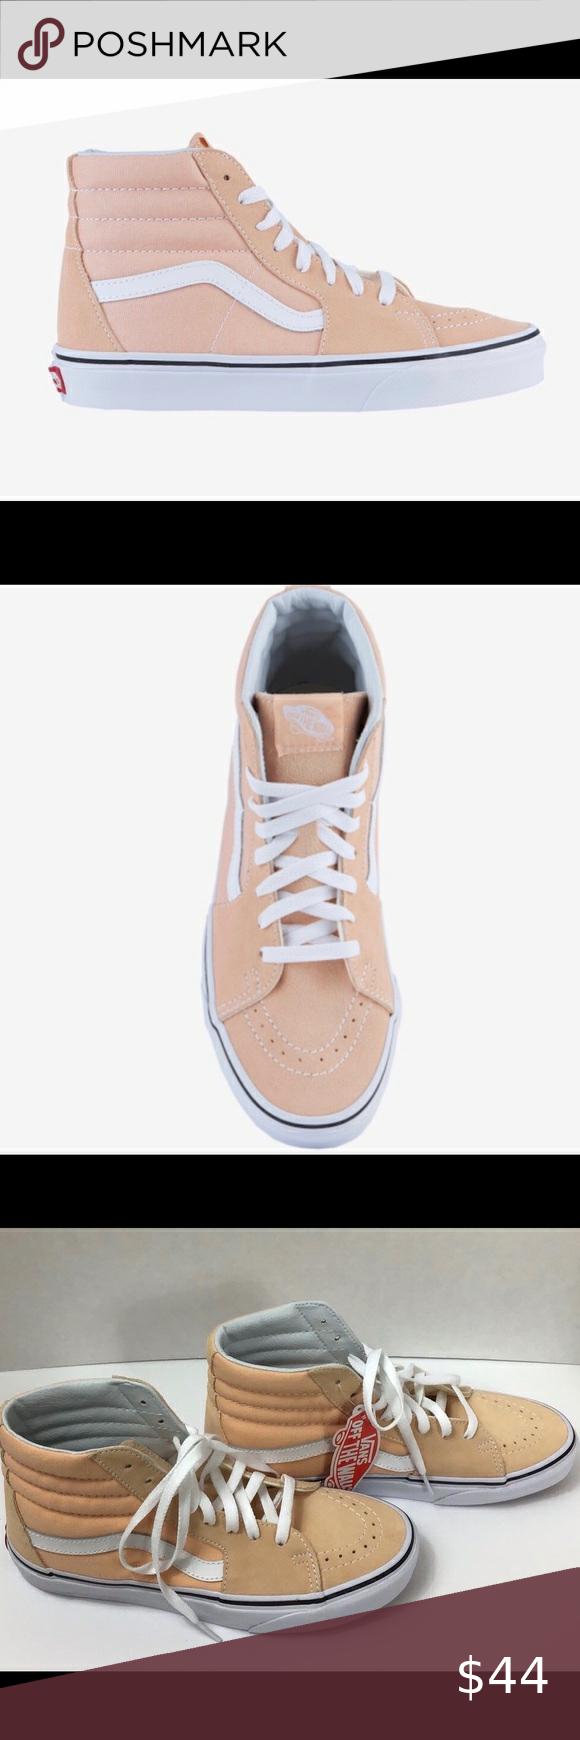 vans shoe measurements